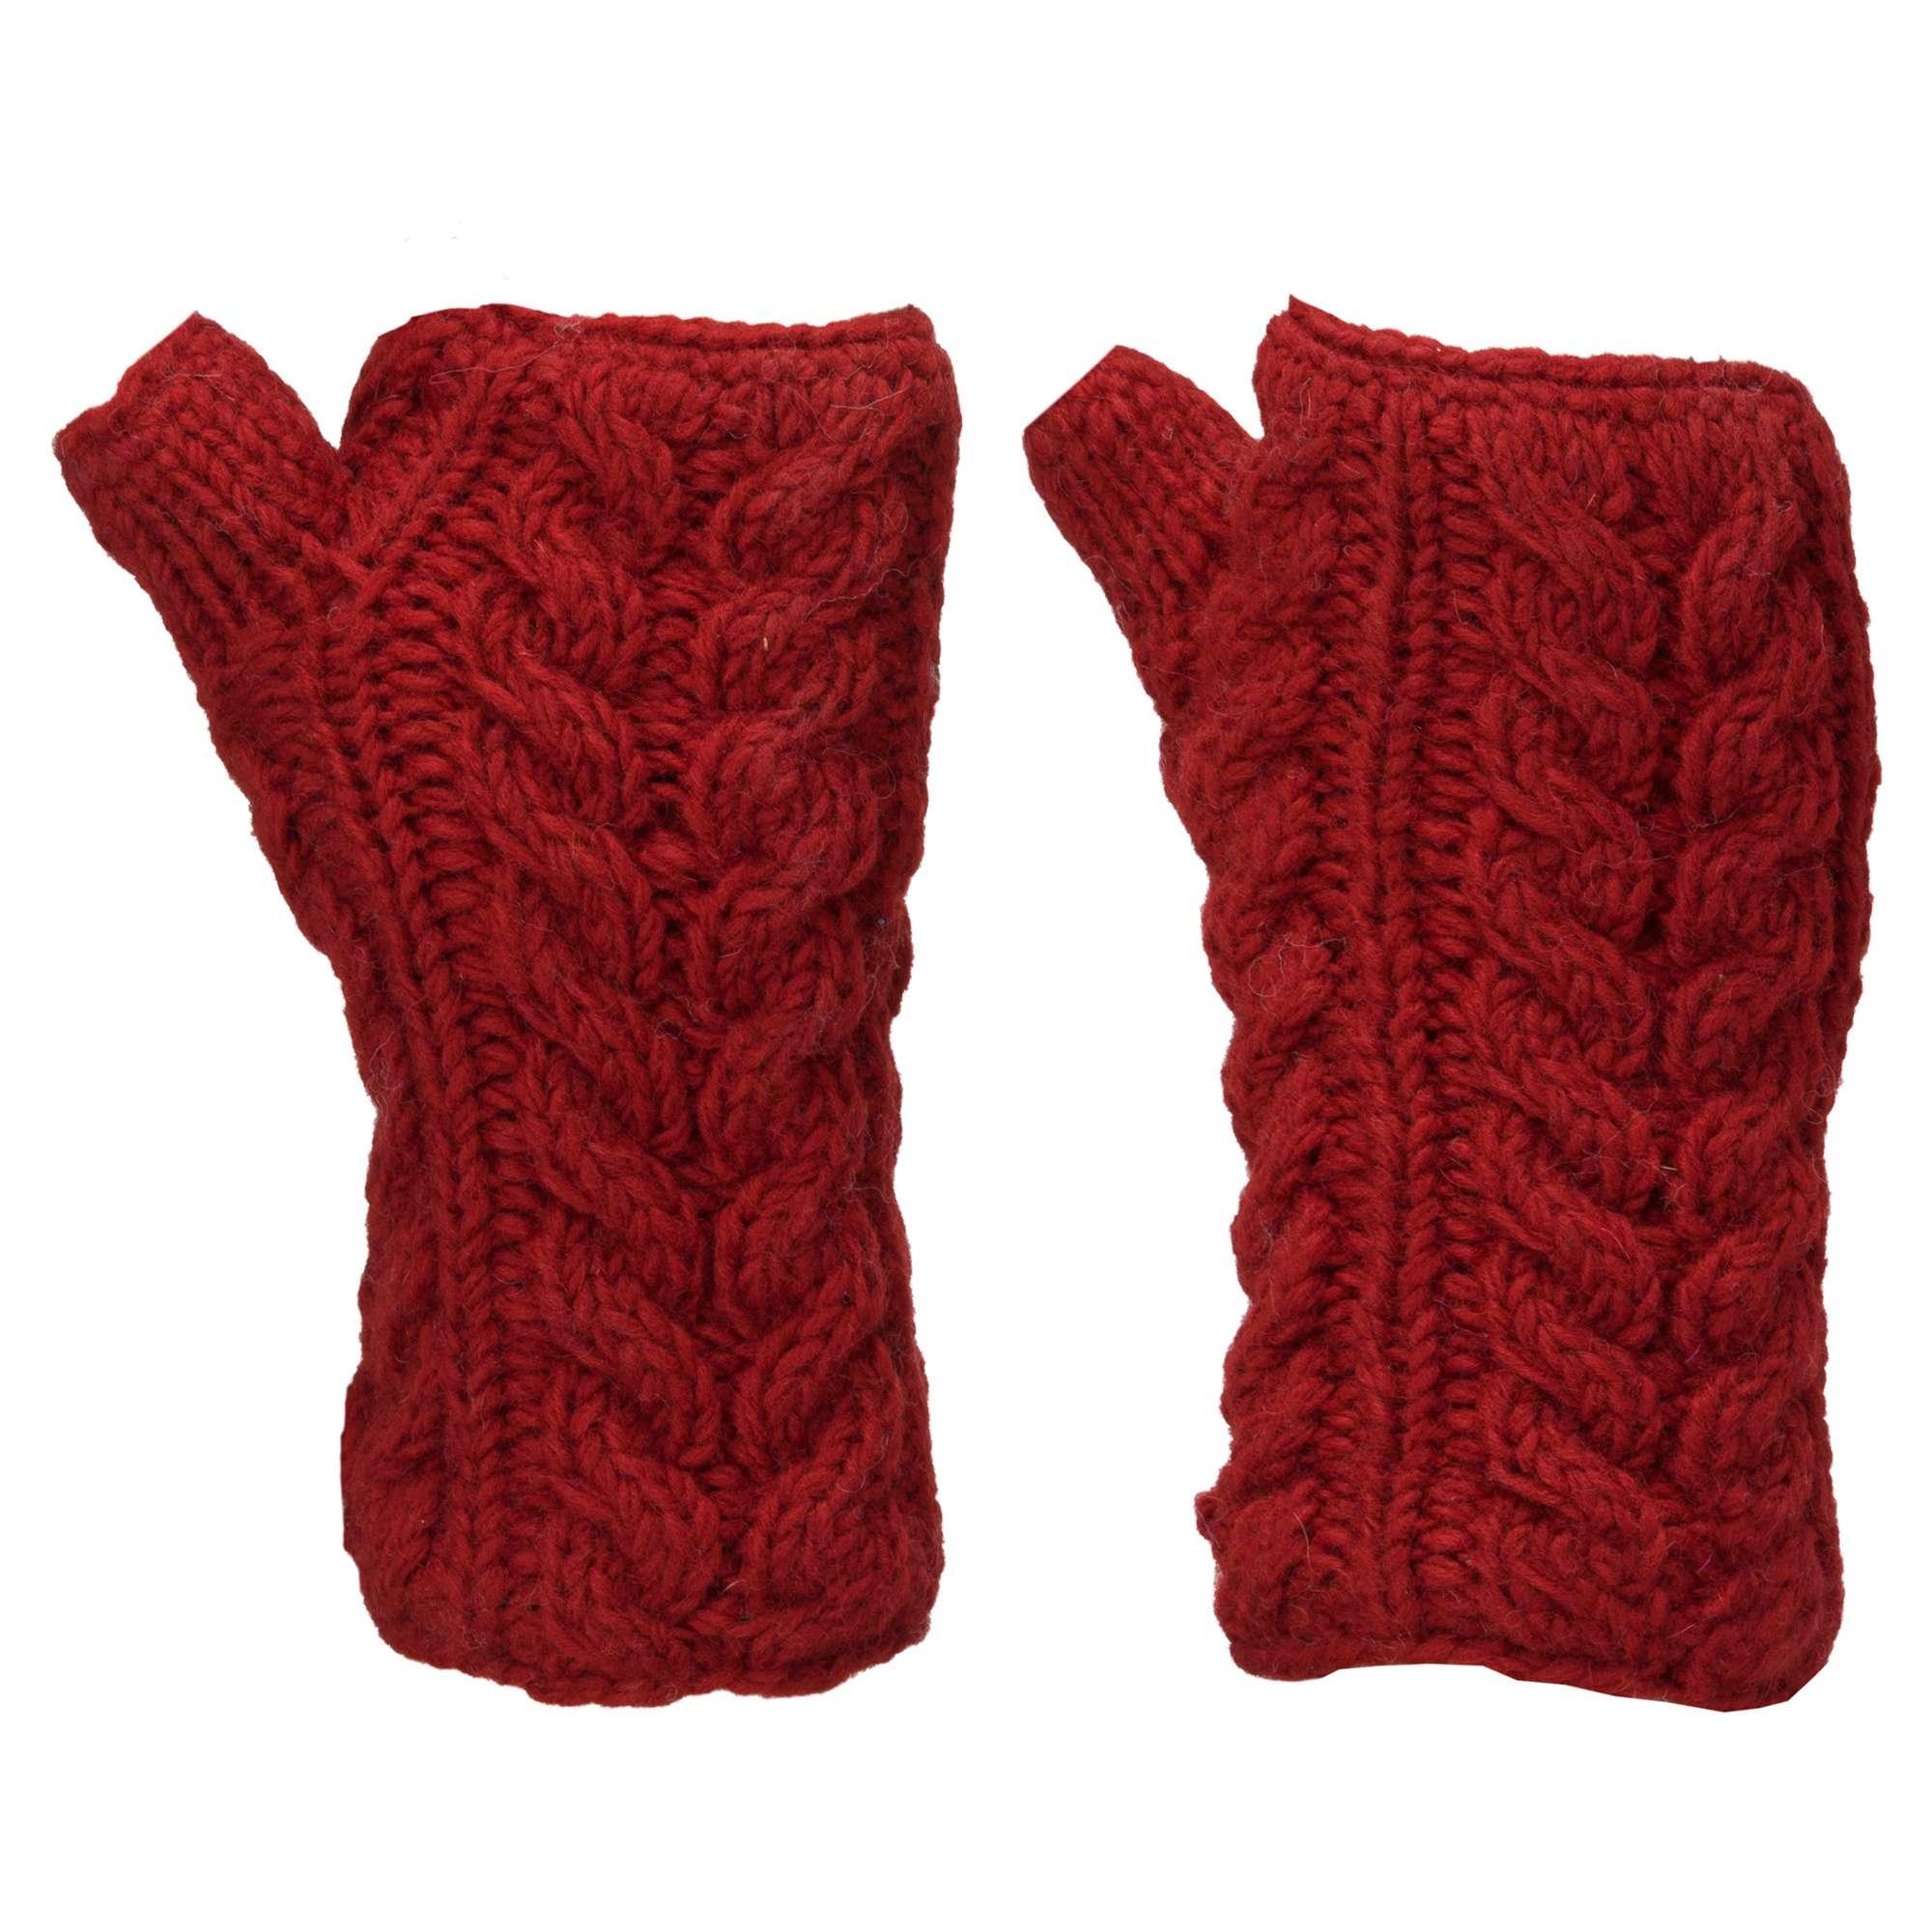 KUSAN Women's Cable Knit Handwarmers